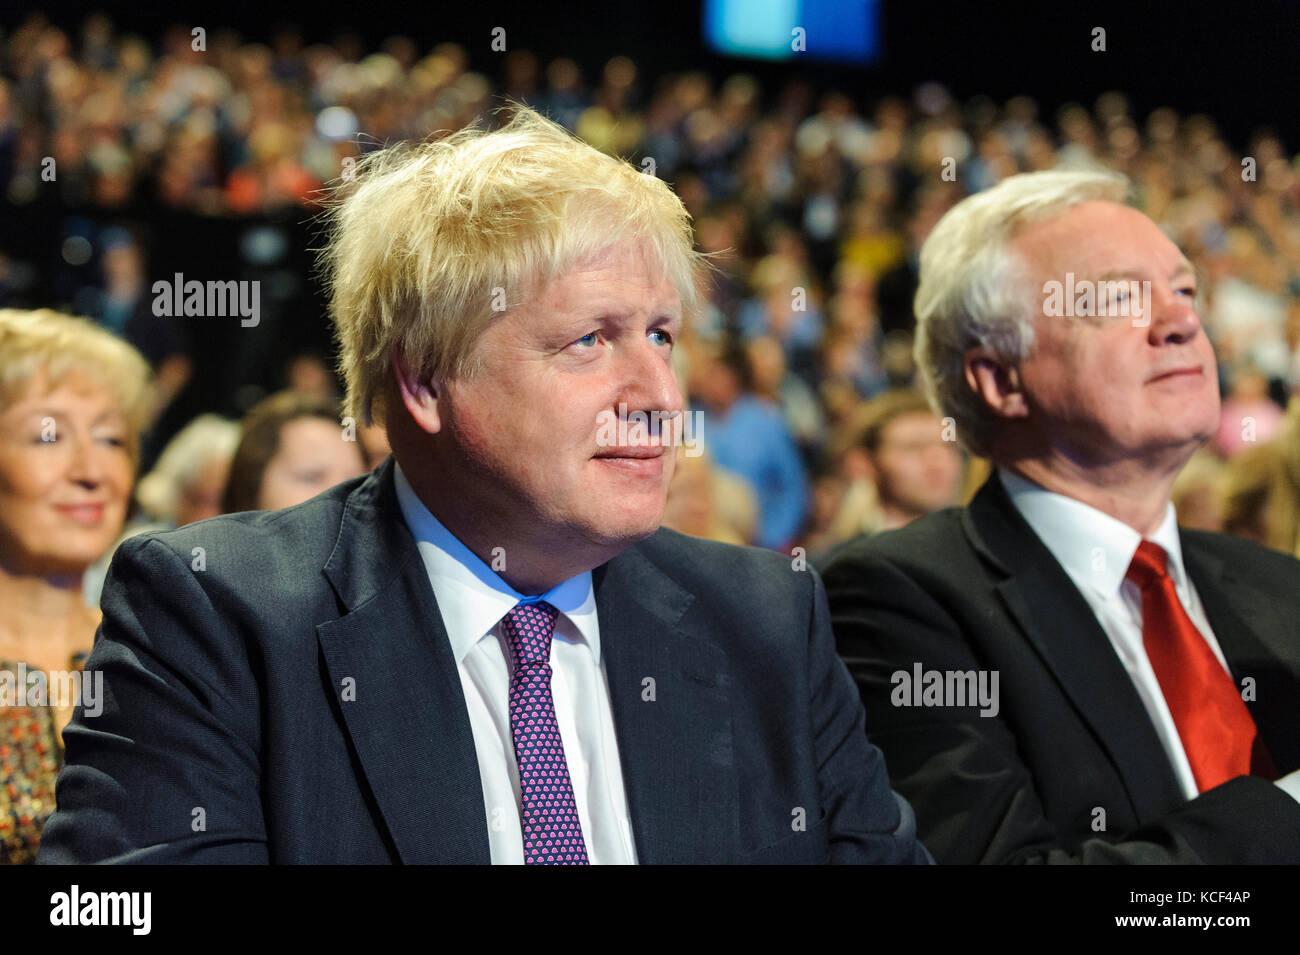 Tory Cabinet Member Stock Photos & Tory Cabinet Member Stock ...